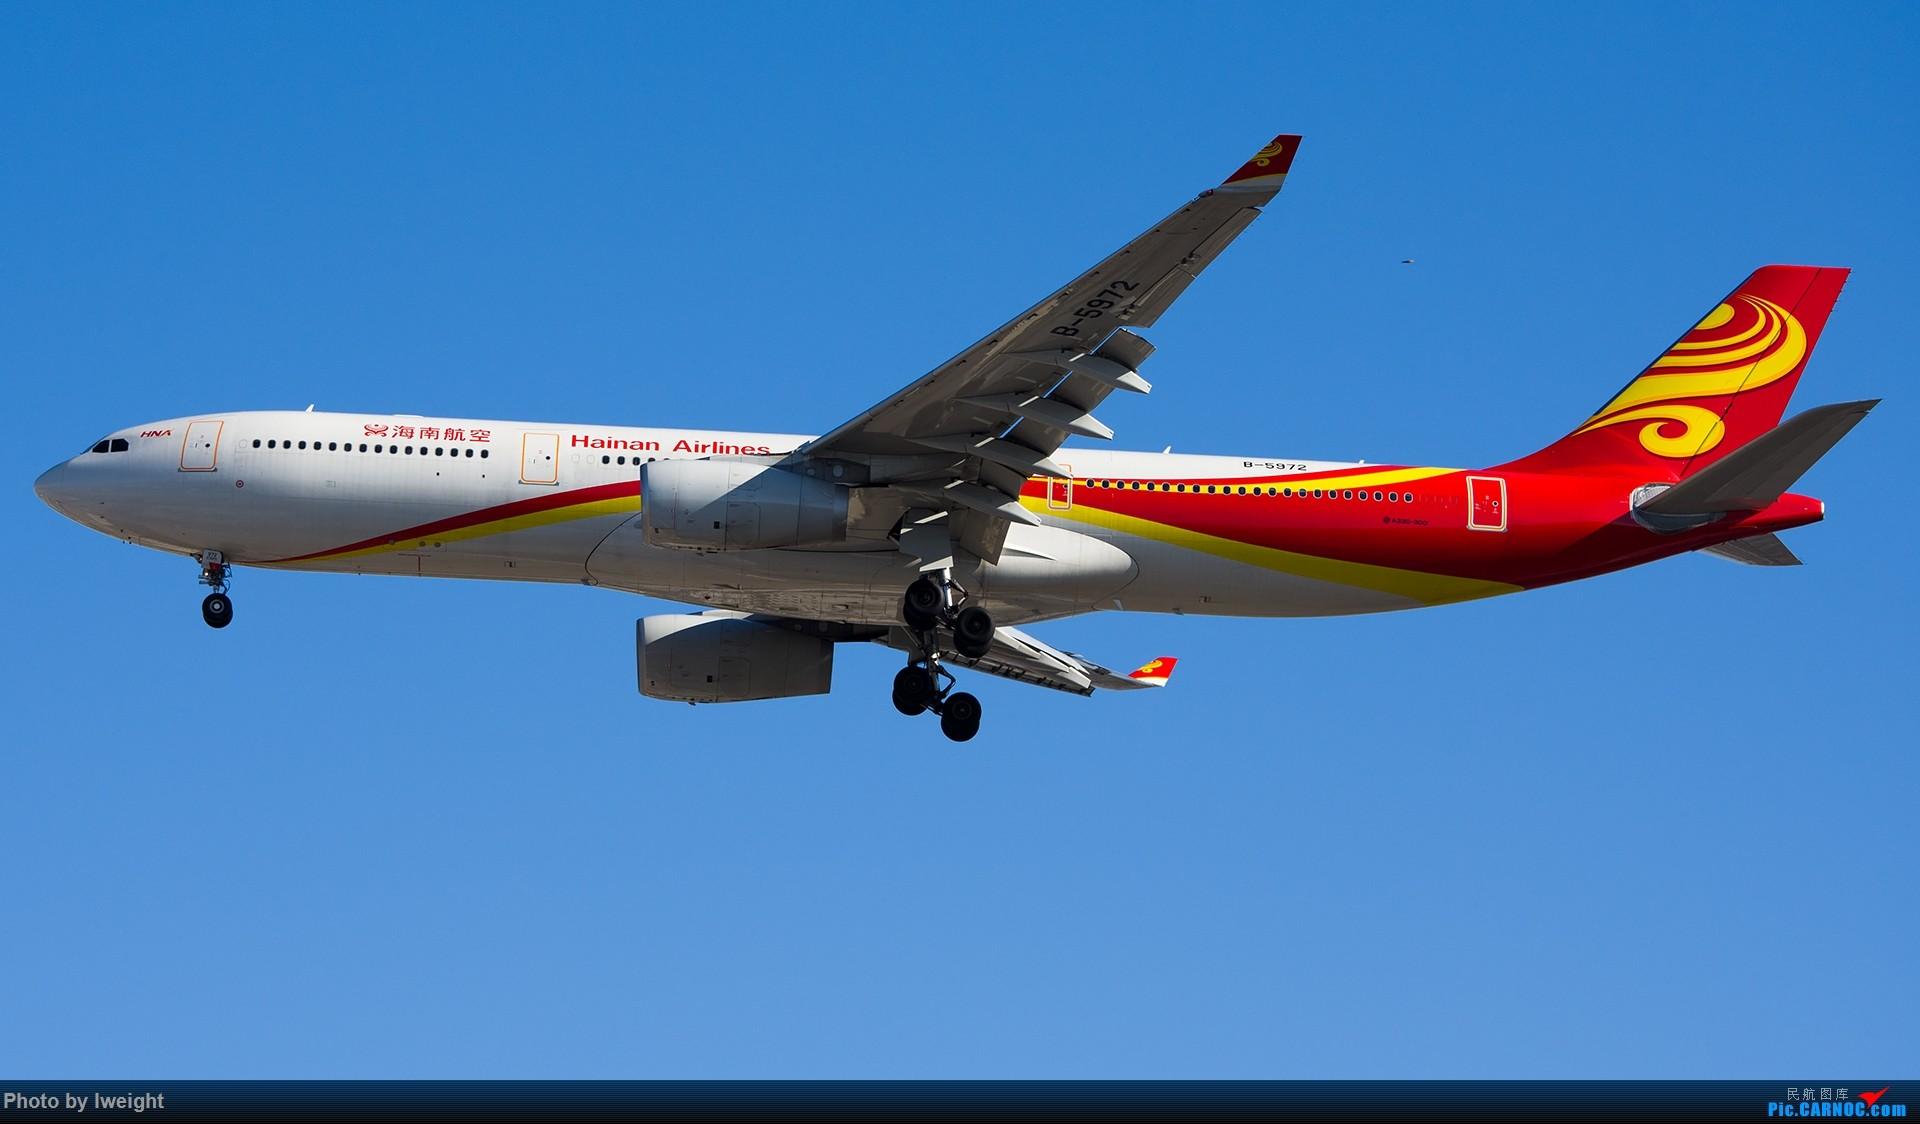 Re:[原创]终于在12月的北京等到了一个晴天的周末,出来拍拍飞机【2015-12-5】 AIRBUS A330-300 B-5972 中国北京首都国际机场